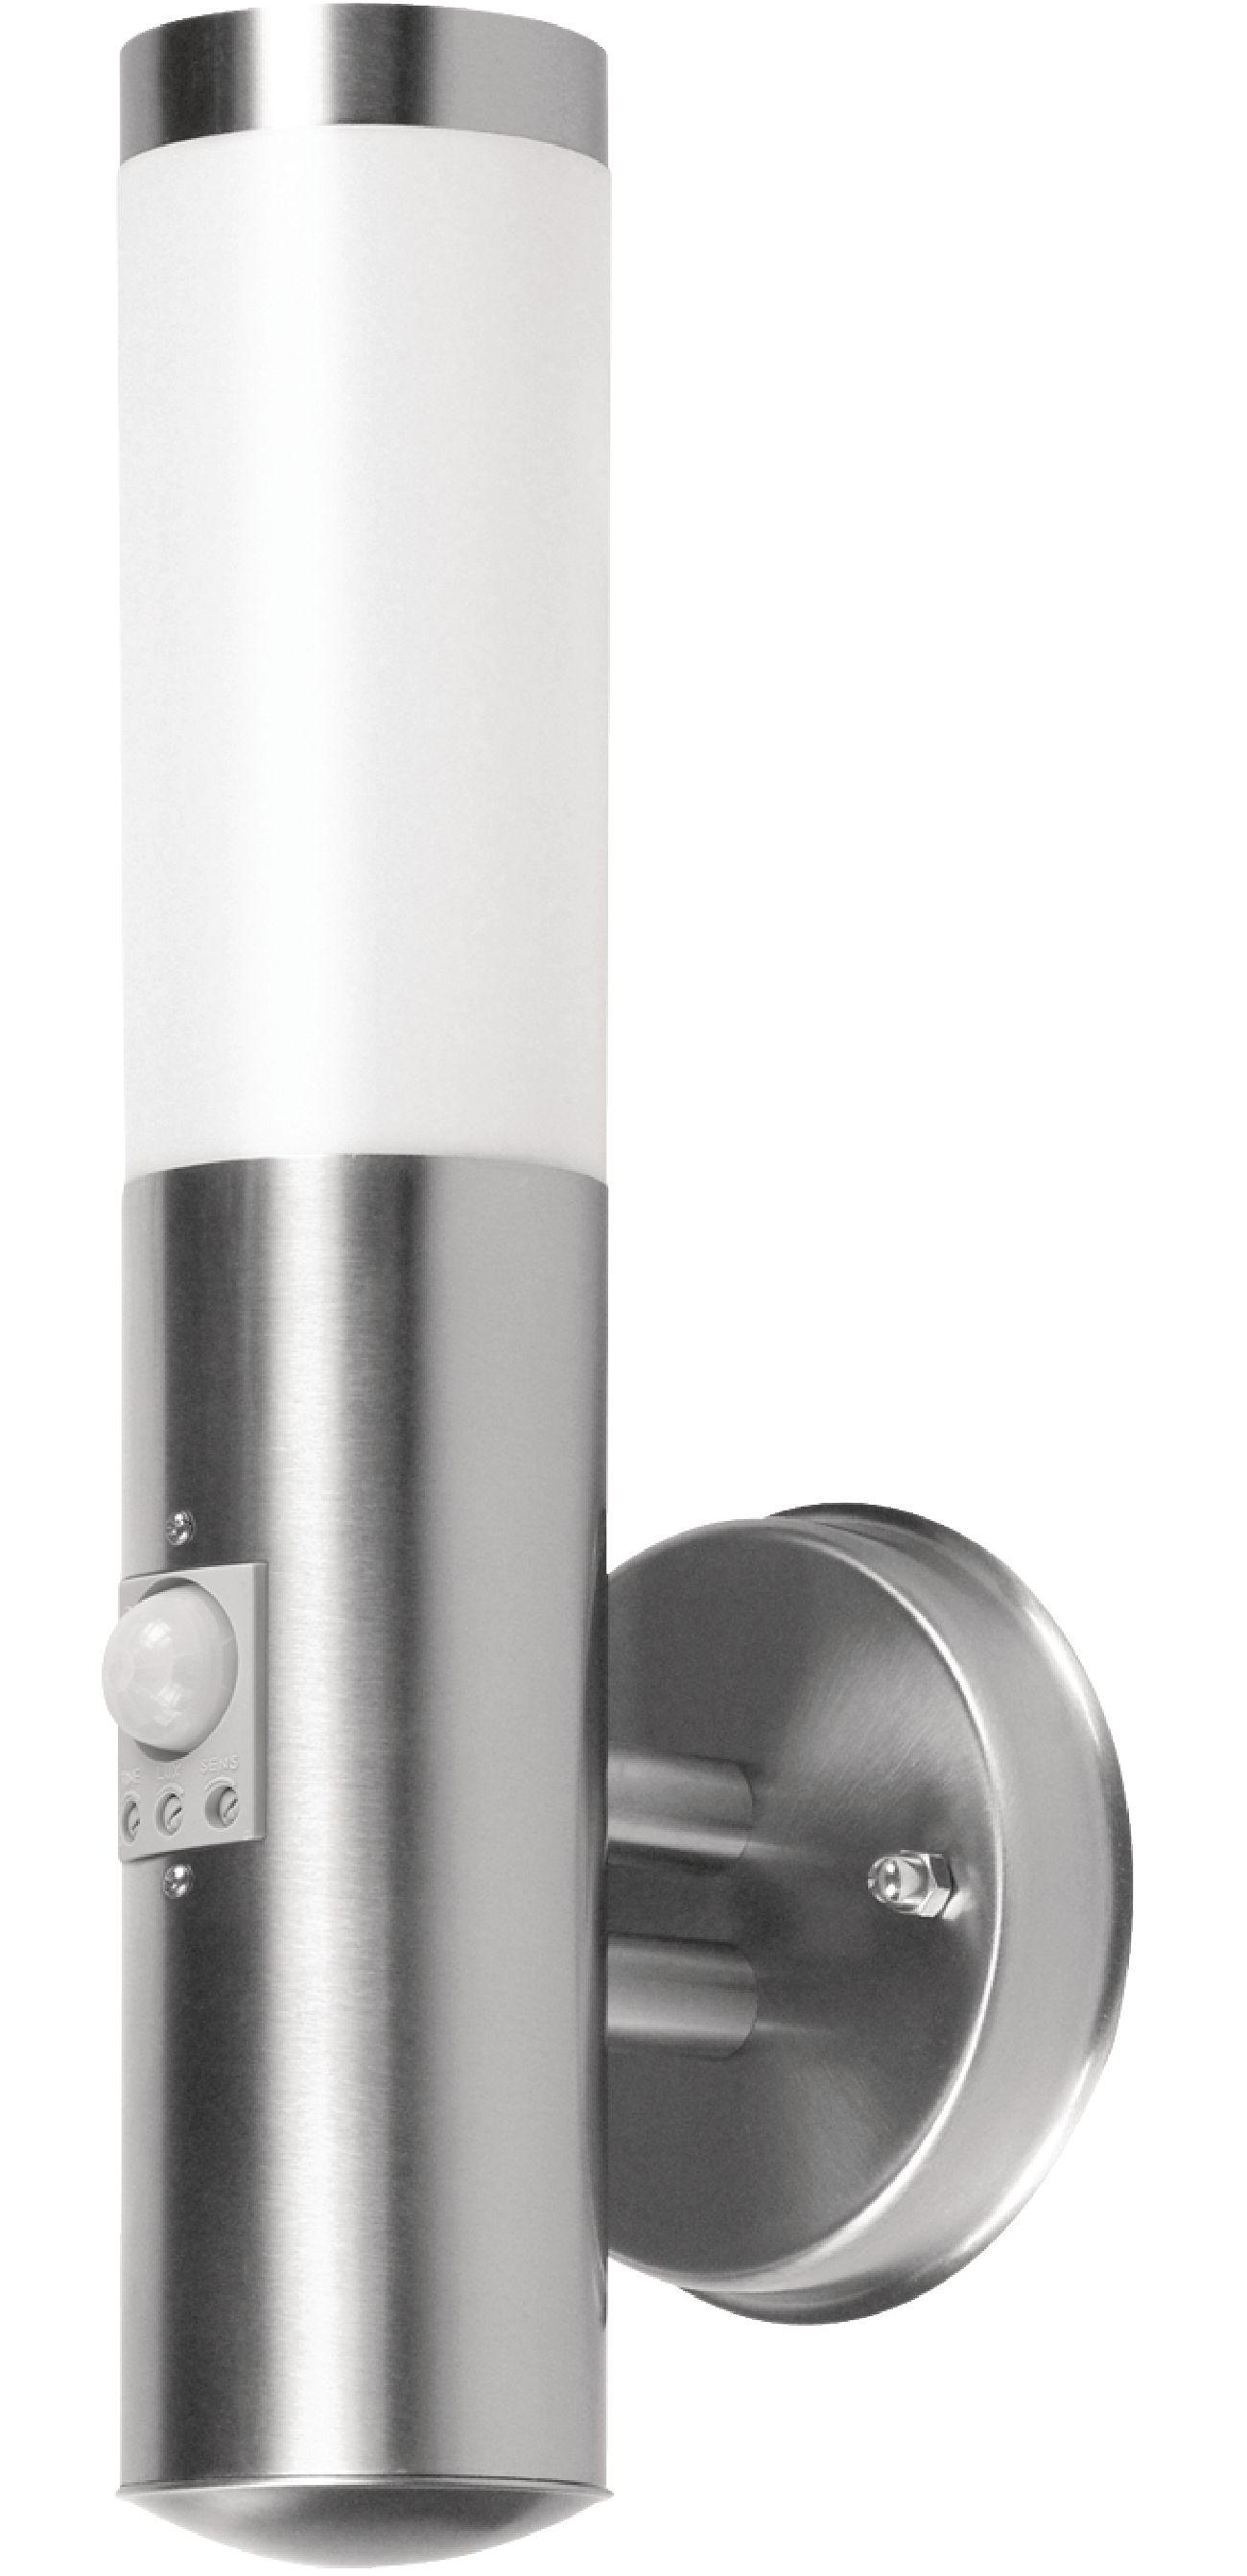 Venkovní nástěnné svítidlo E27 PIR Ranex RX1010-38R-S